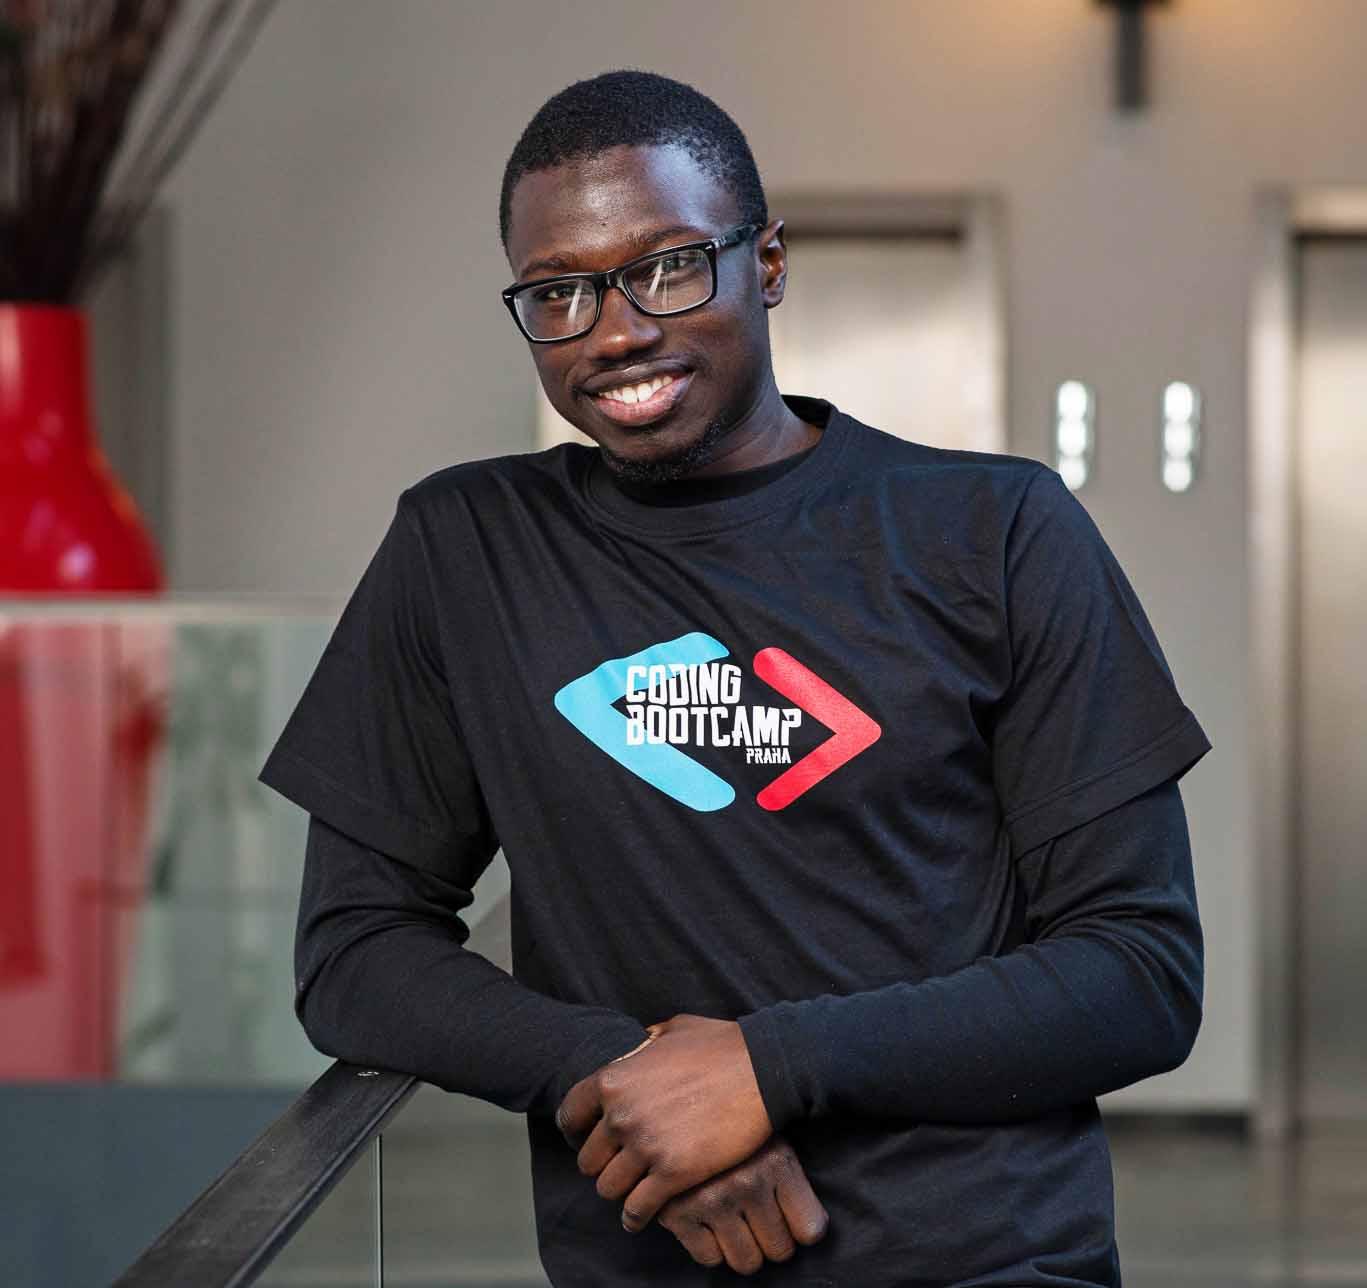 Coding Bootcamp Praha Students Mohamed Touré